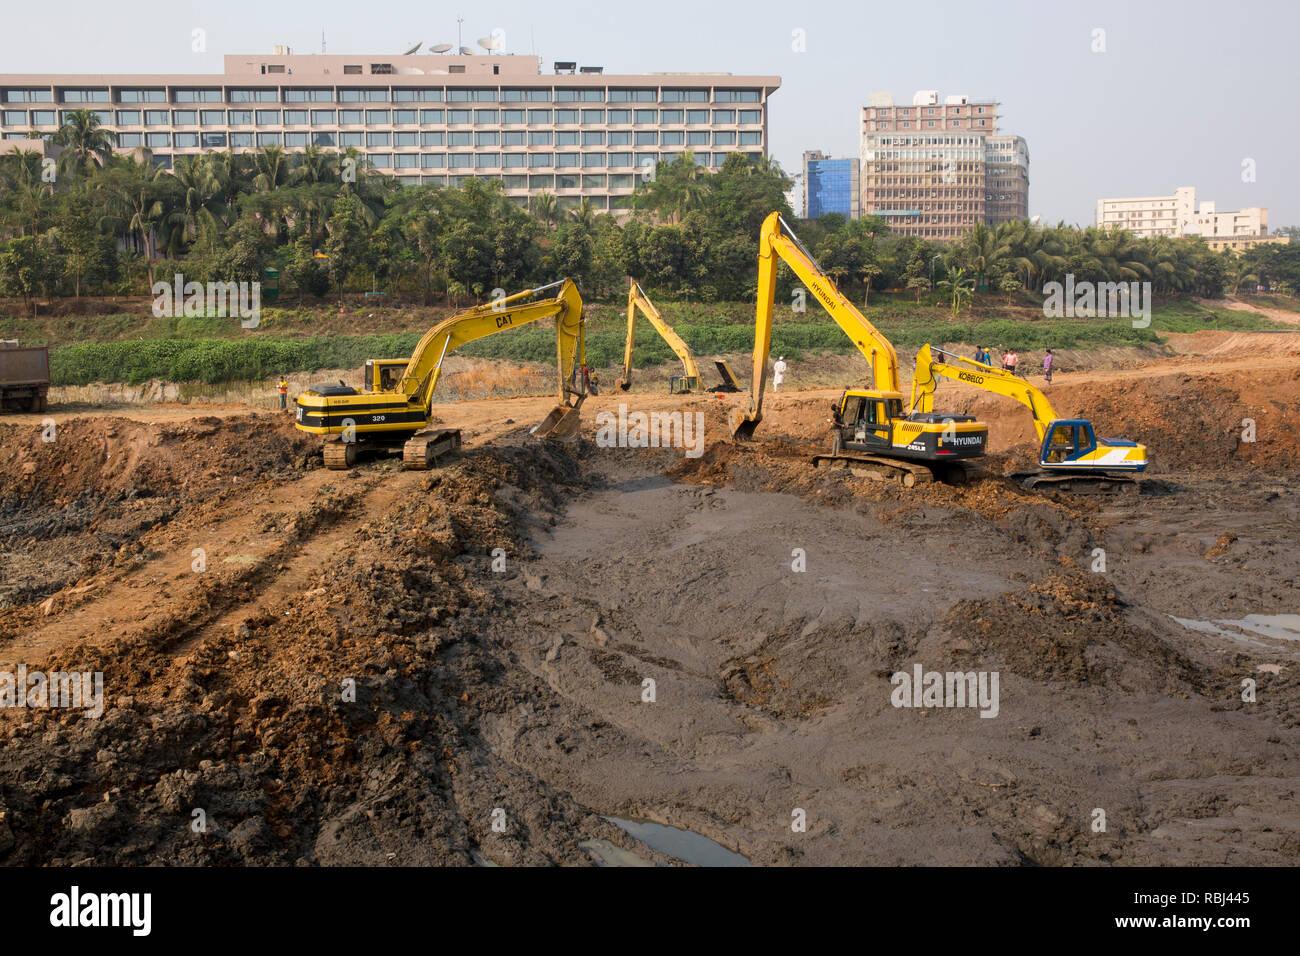 DHAKA, BANGLADESH - JANUARY 10 : Labors working at a development